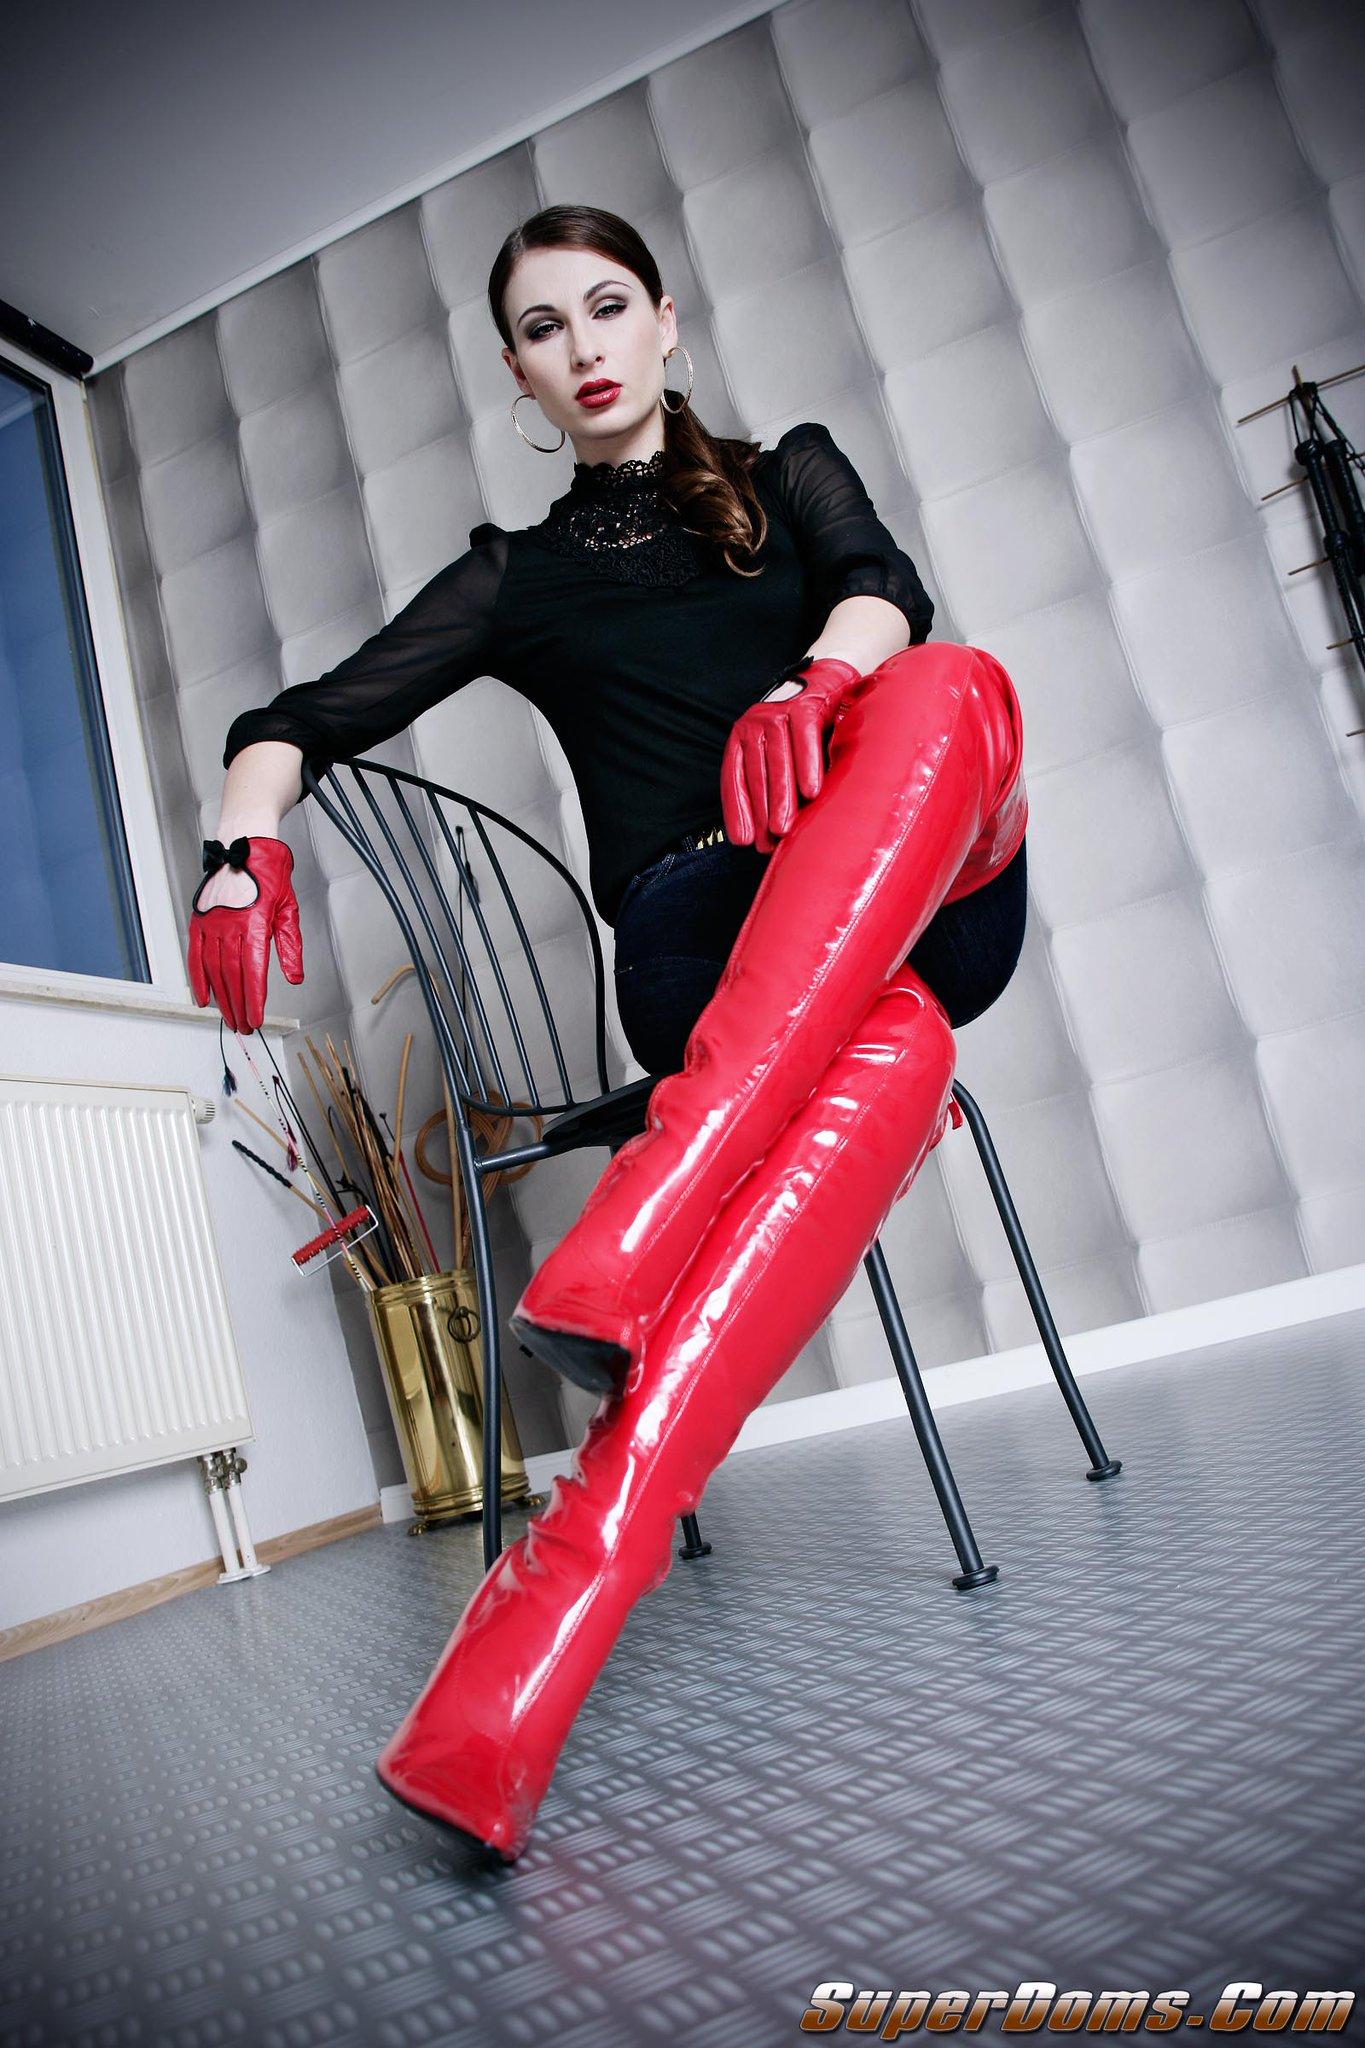 femdomfoto.de on Twitter: new wonderful pov images of